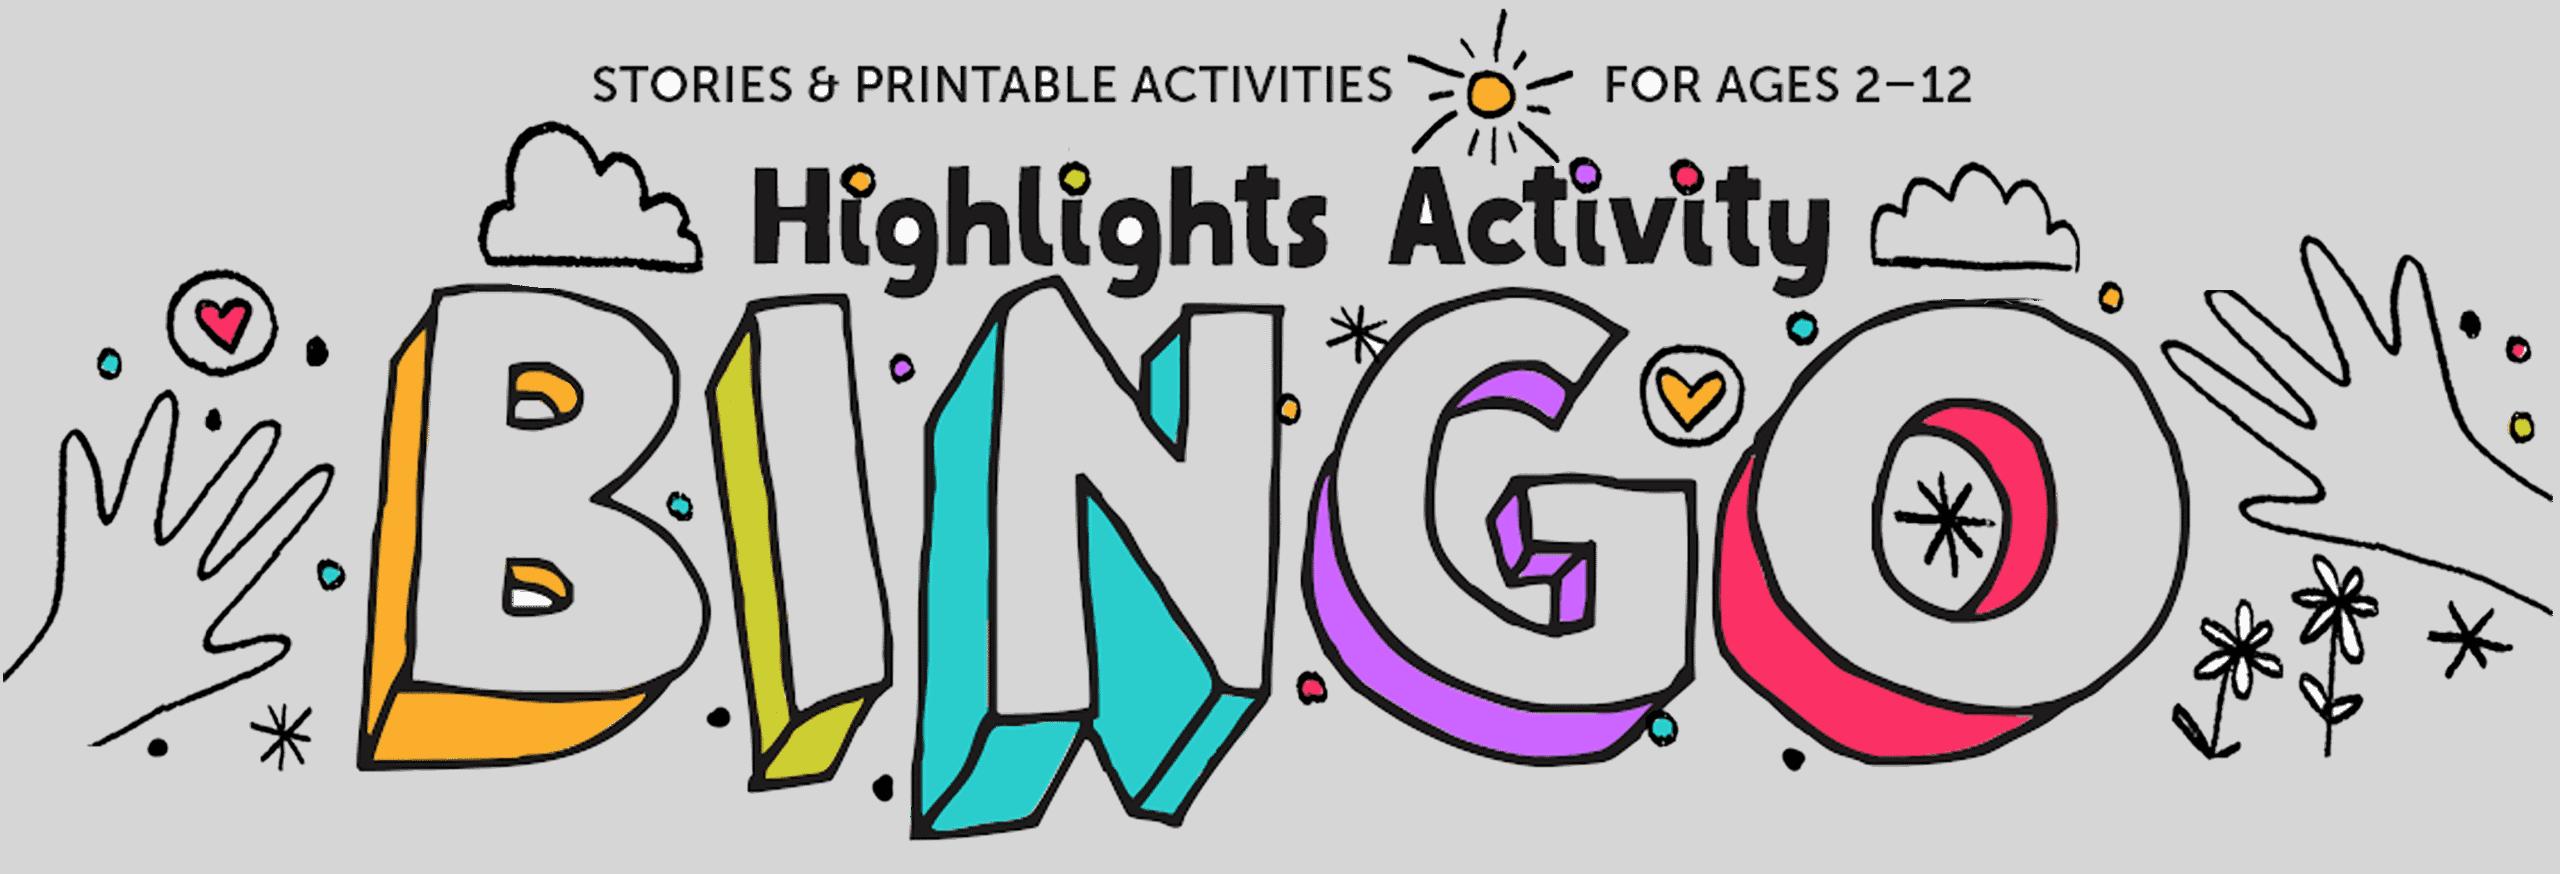 Bingo: Highlights Activity